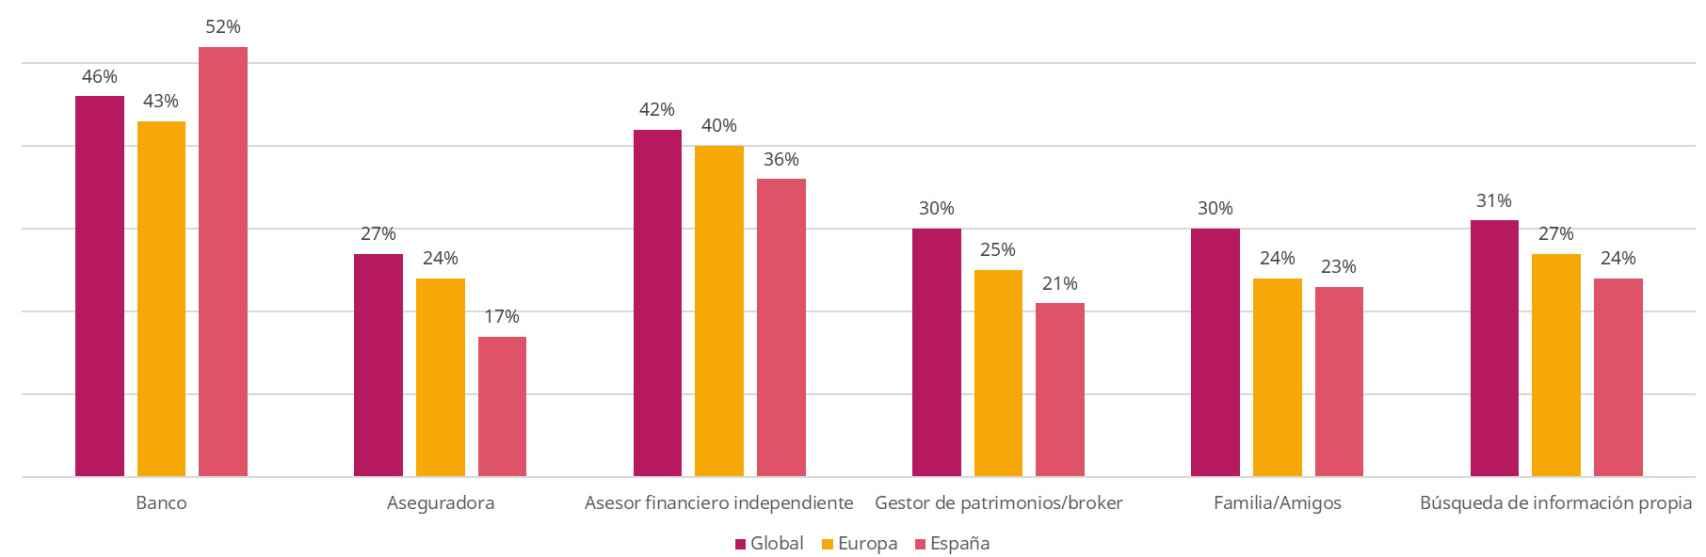 ¿A quién recurren los españoles a la hora de invertir?